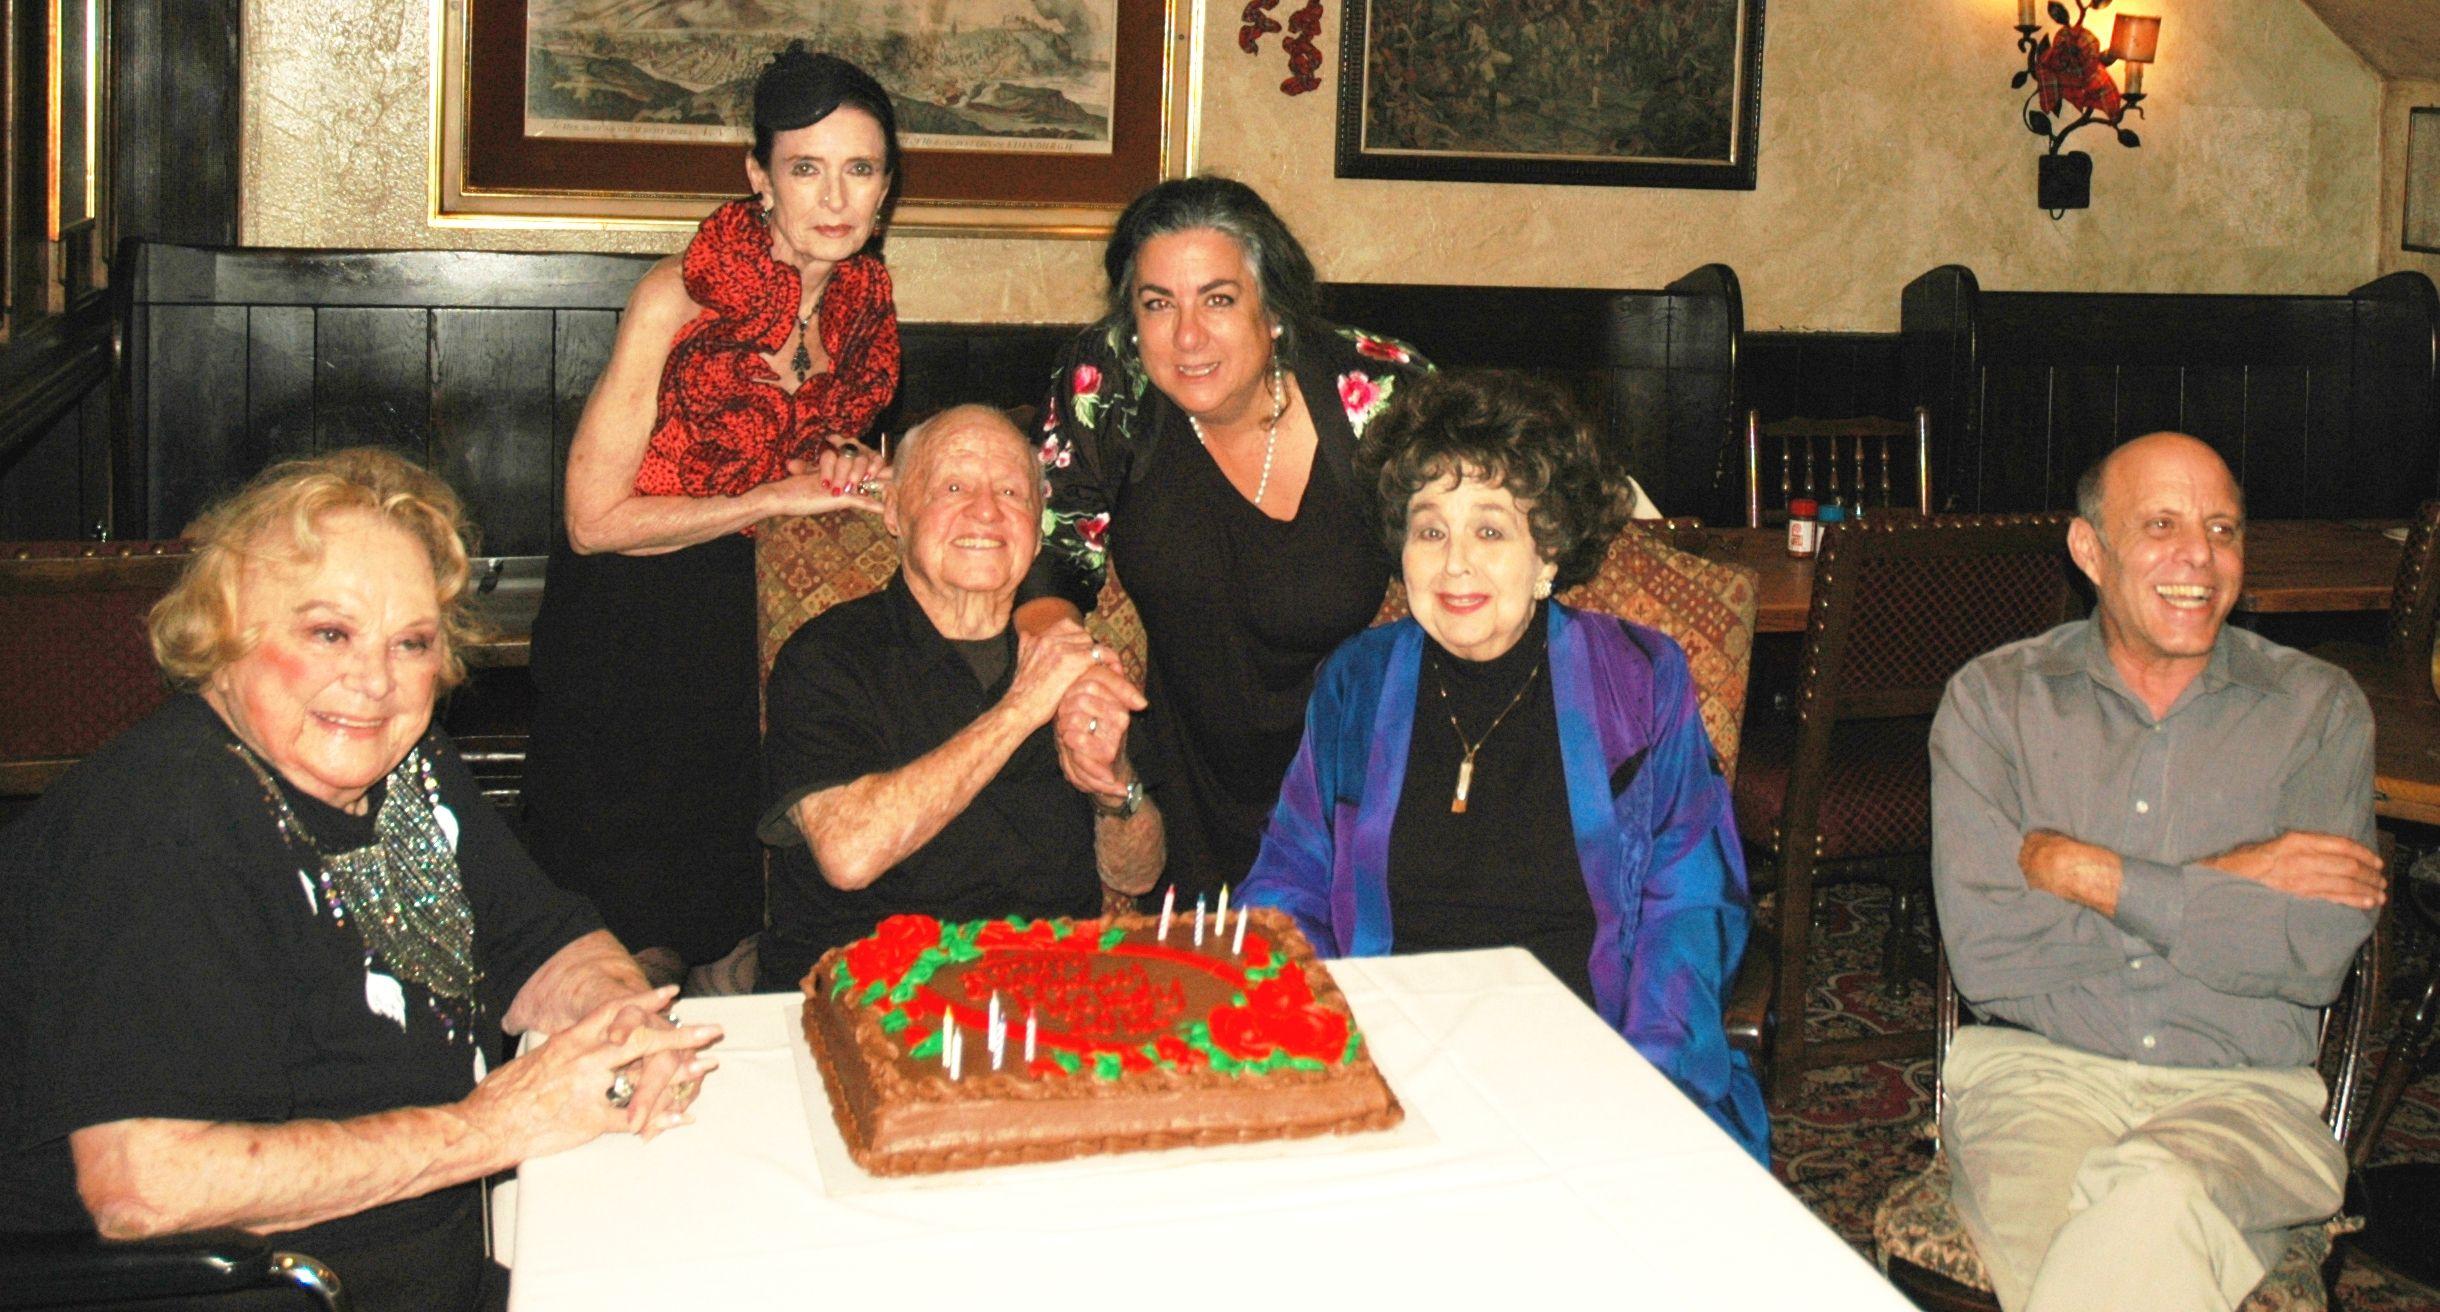 Hos Mickey Rooneys 92. fødselsdagsfest fra venstre mod højre-4542